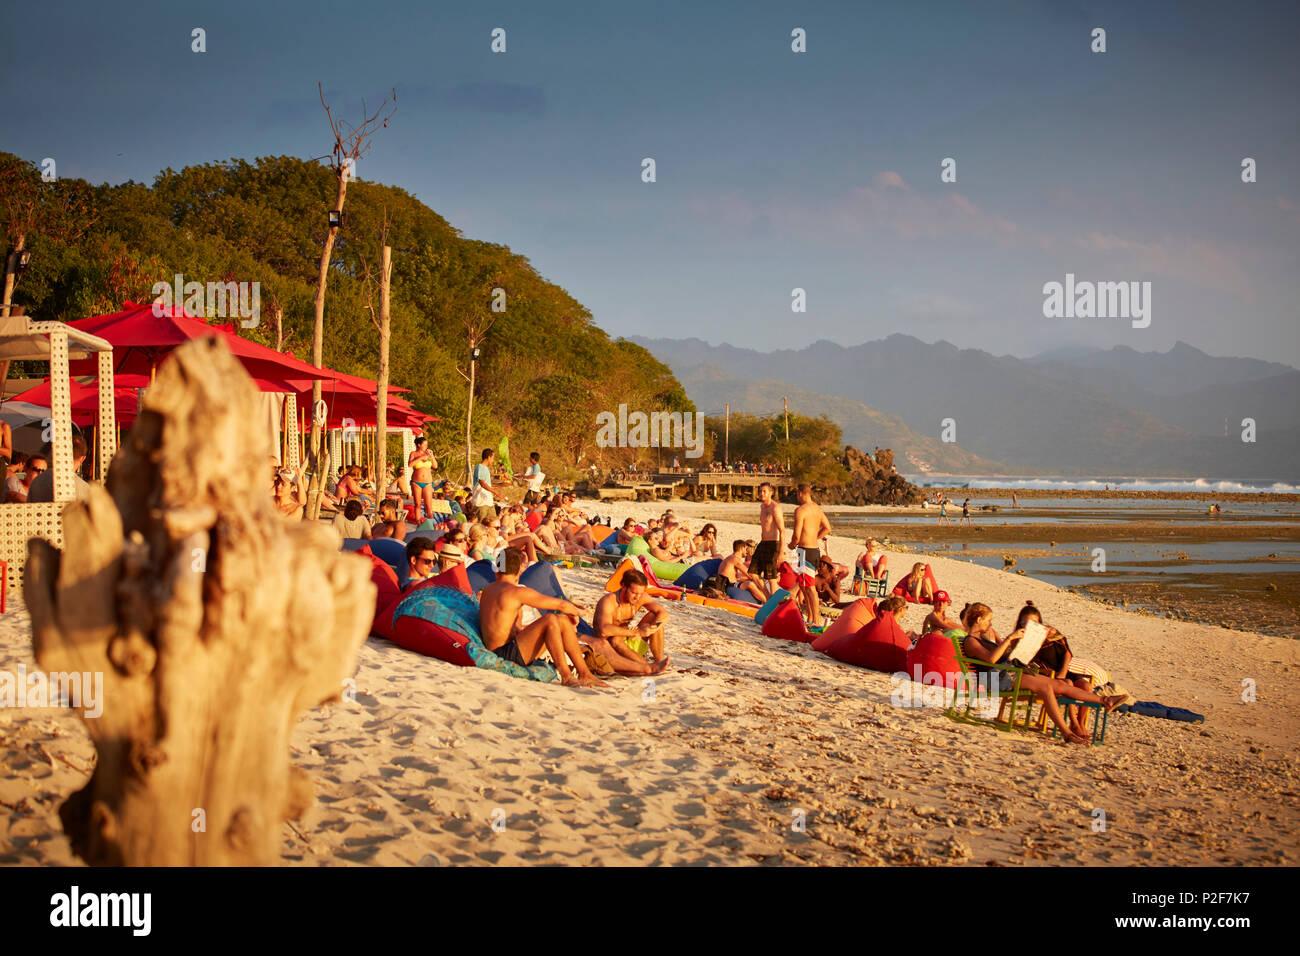 Guests in a beach bar, Gili Trawangan, Lombok, Indonesia - Stock Image